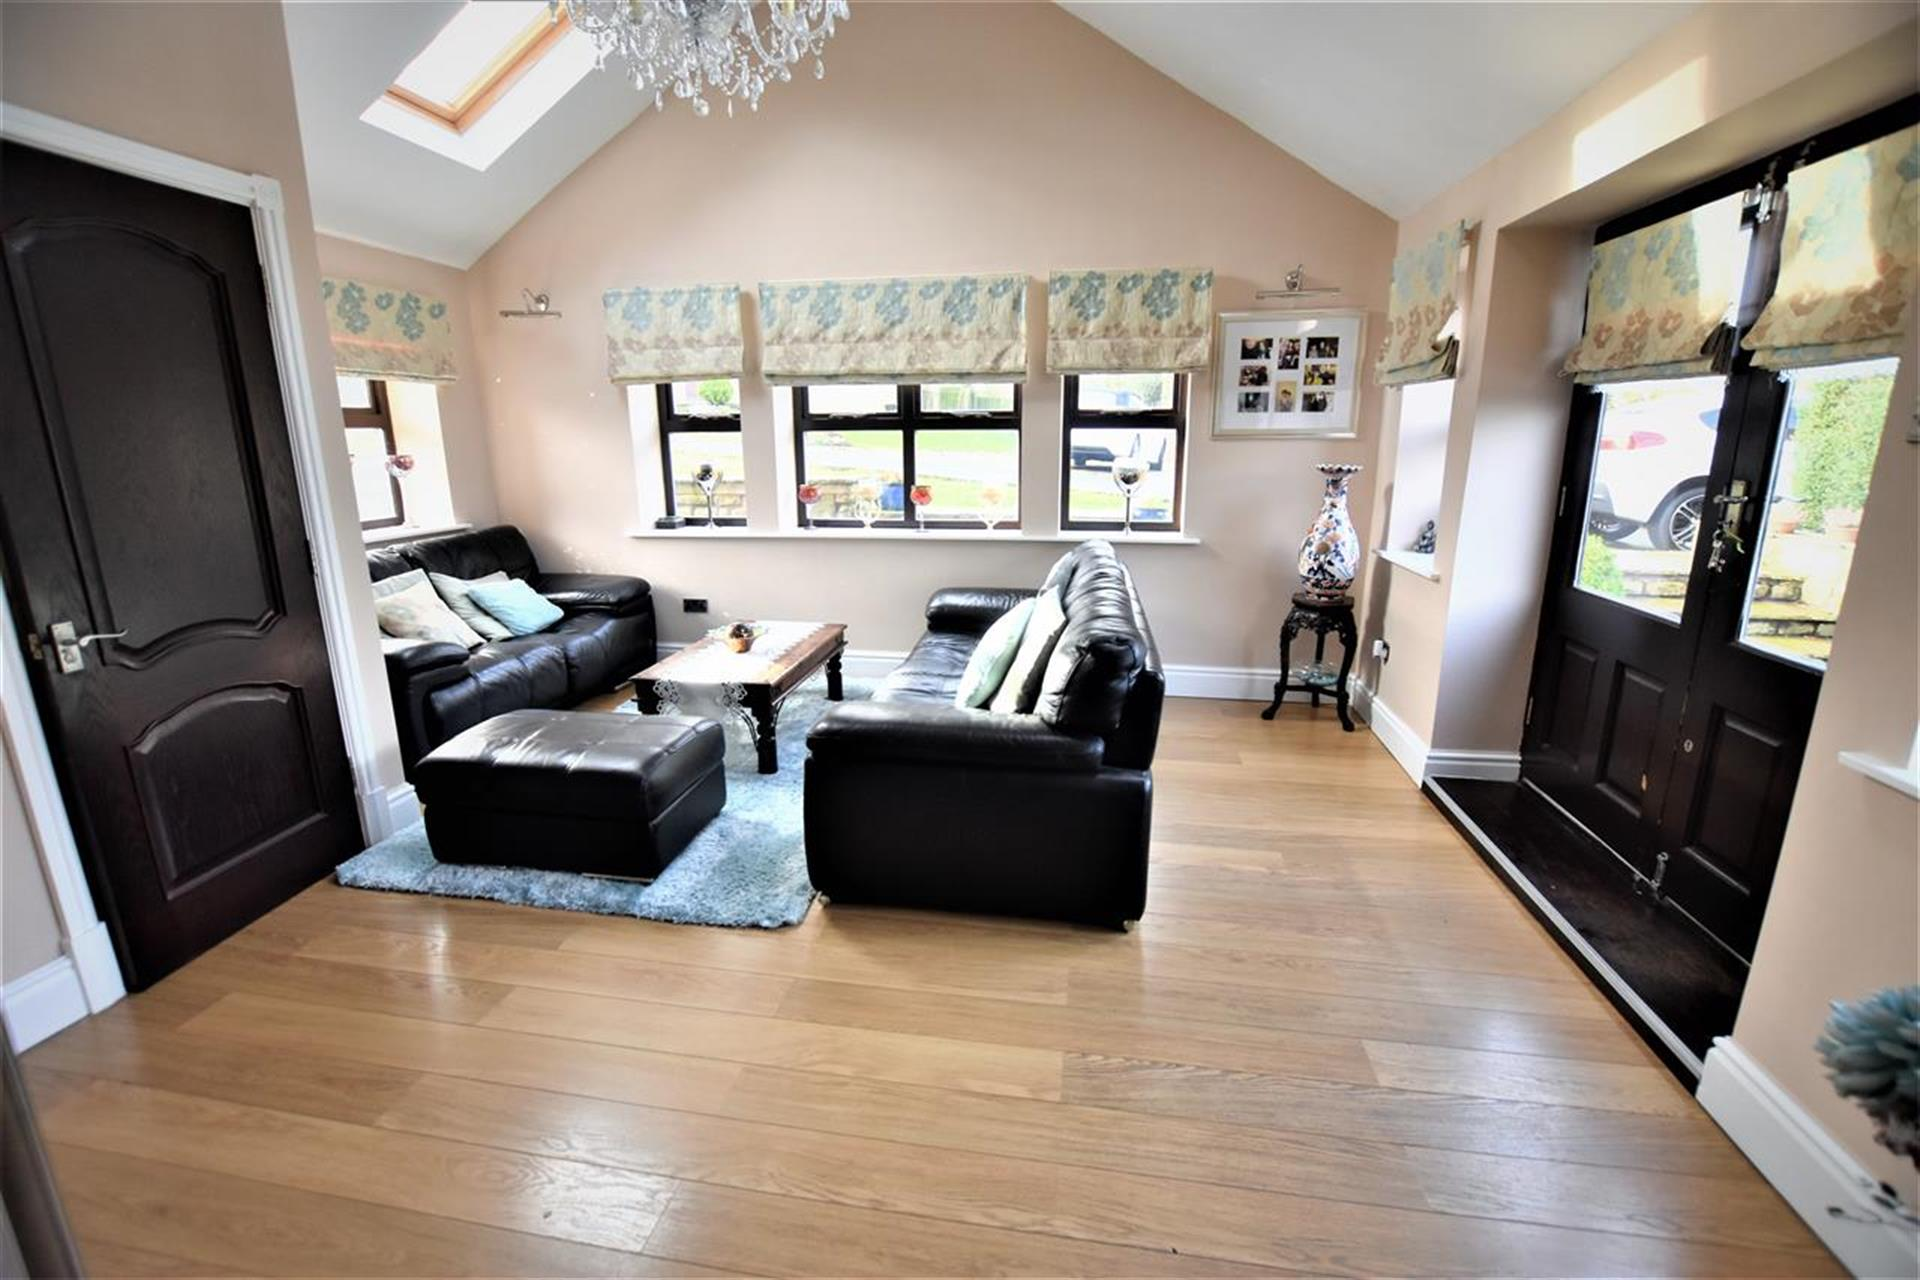 4 Bedroom Detached House For Sale - Reception Room 3